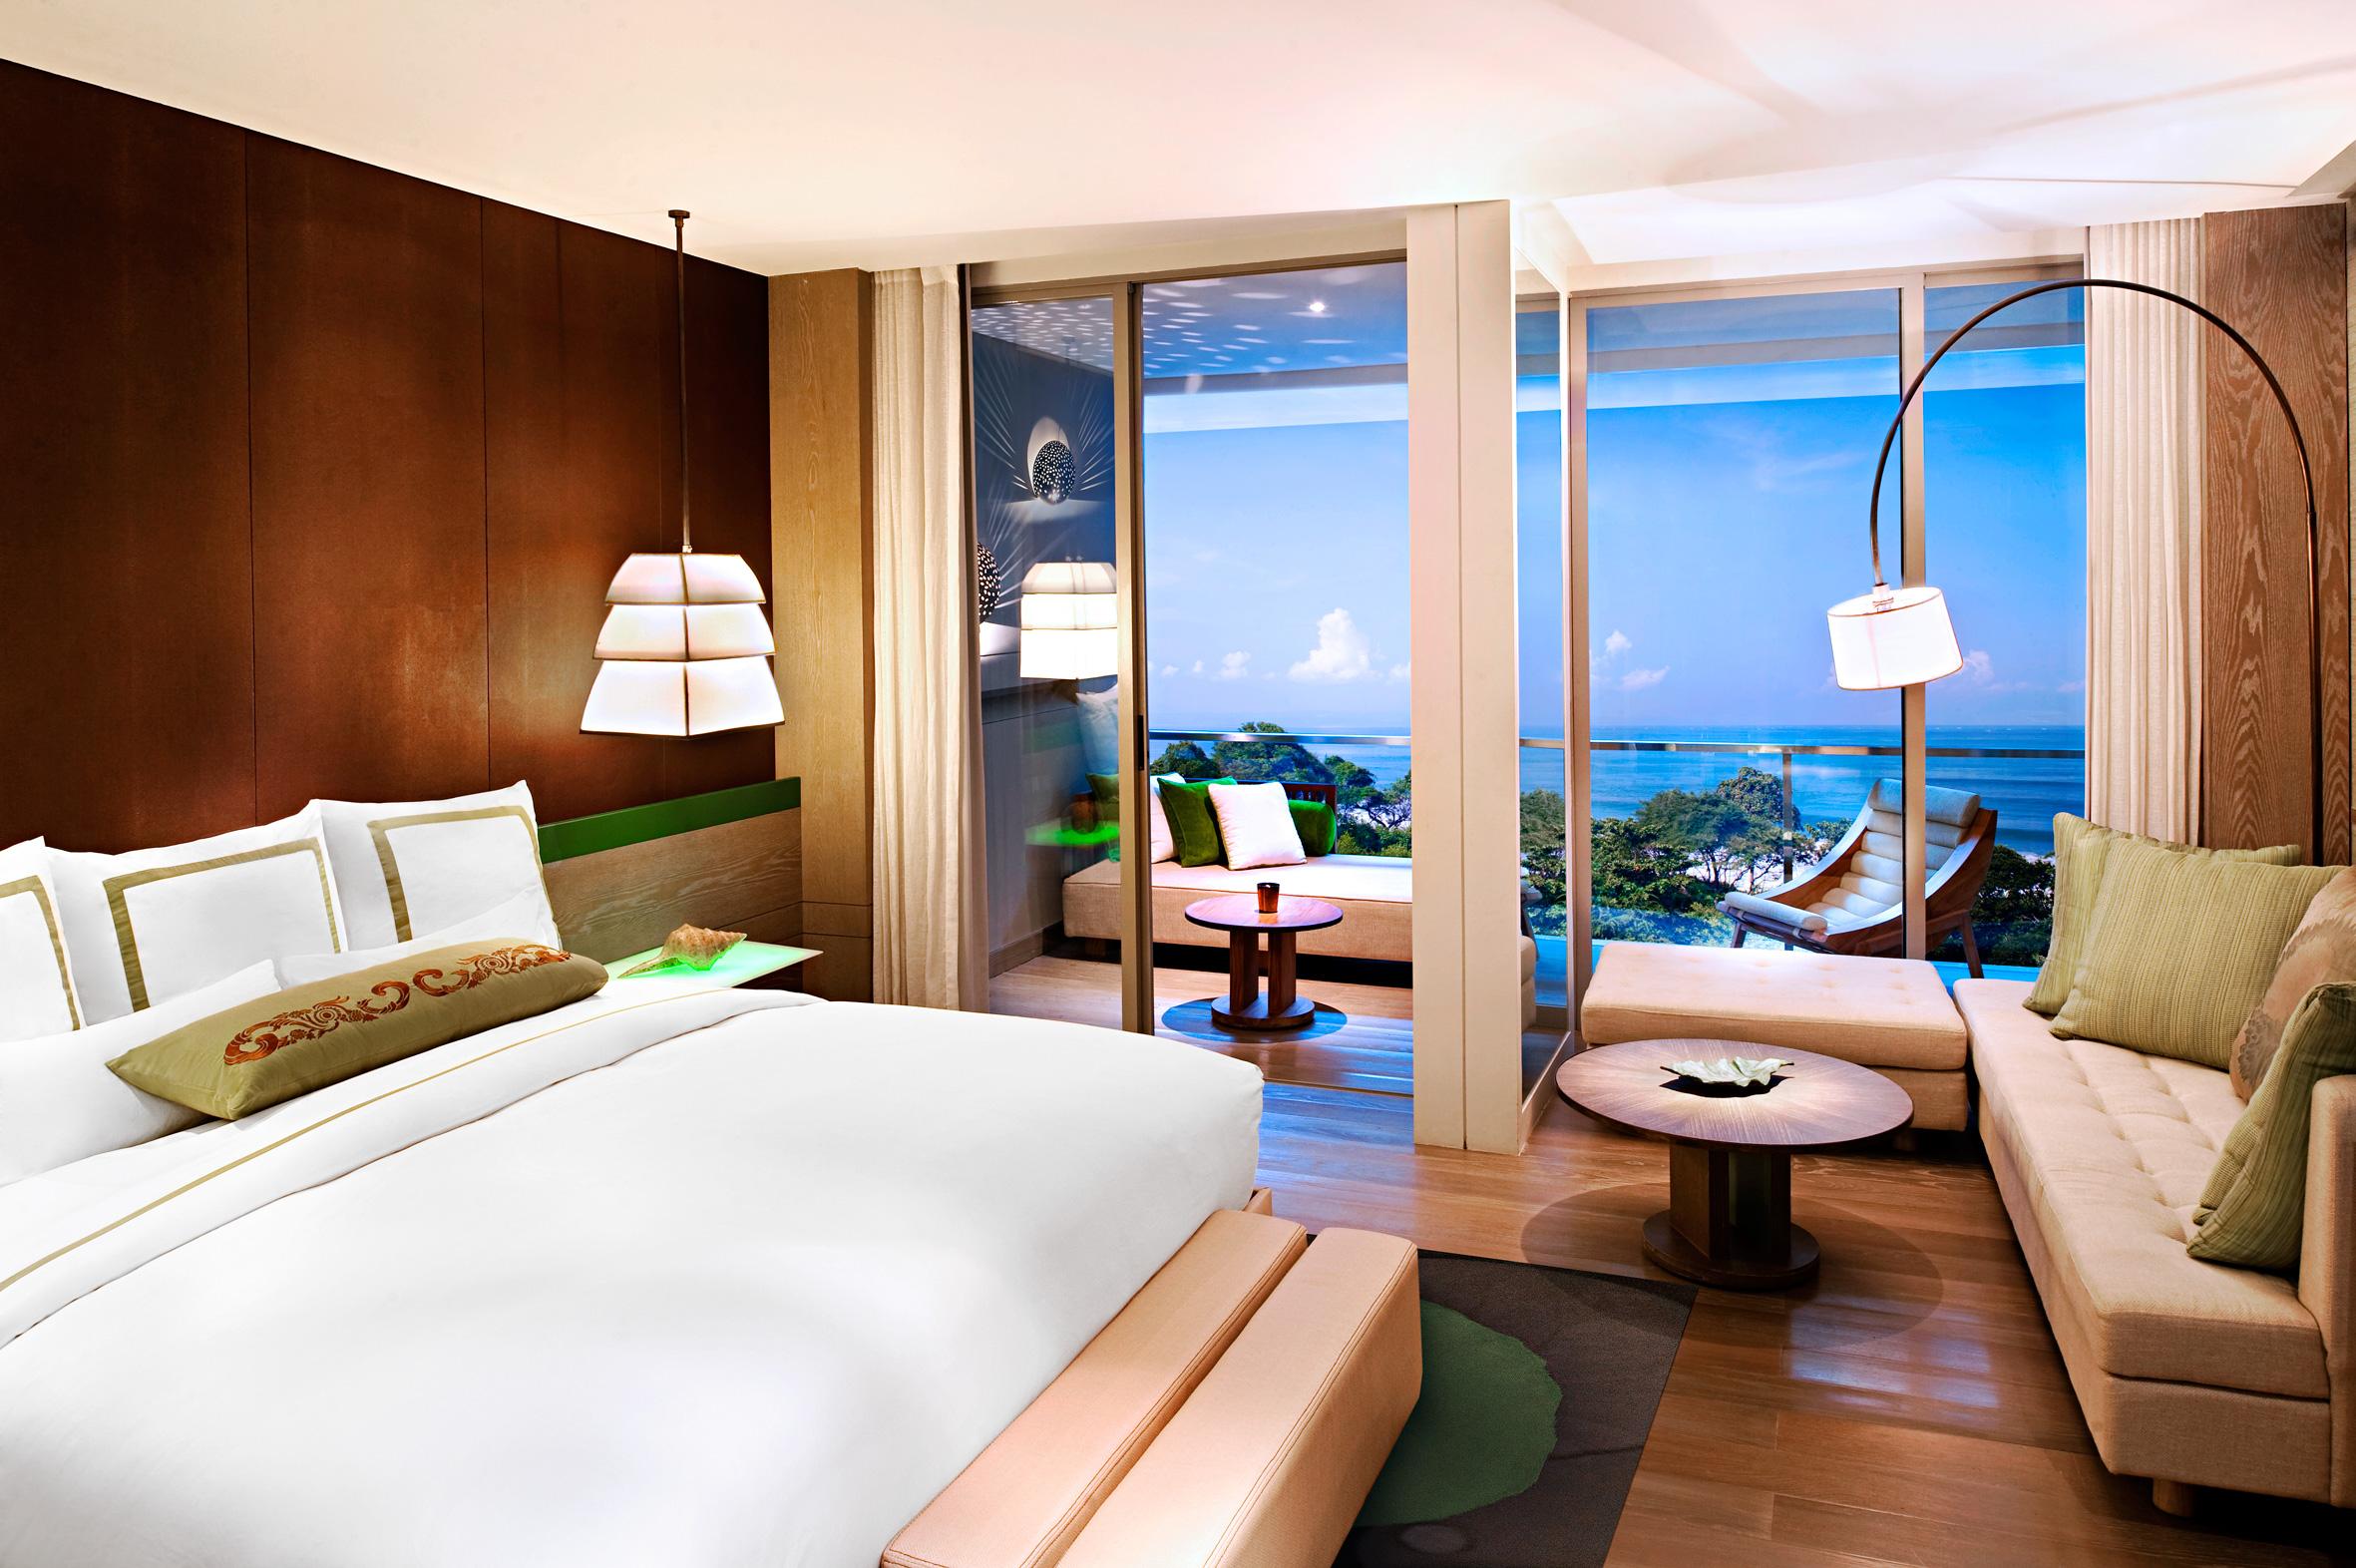 ... W Hotels Worldwide Unveils W Retreat \u0026 Spa Bali & W Hotels Worldwide Unveils W Retreat \u0026 Spa Bali \u2013 Seminyak the ...